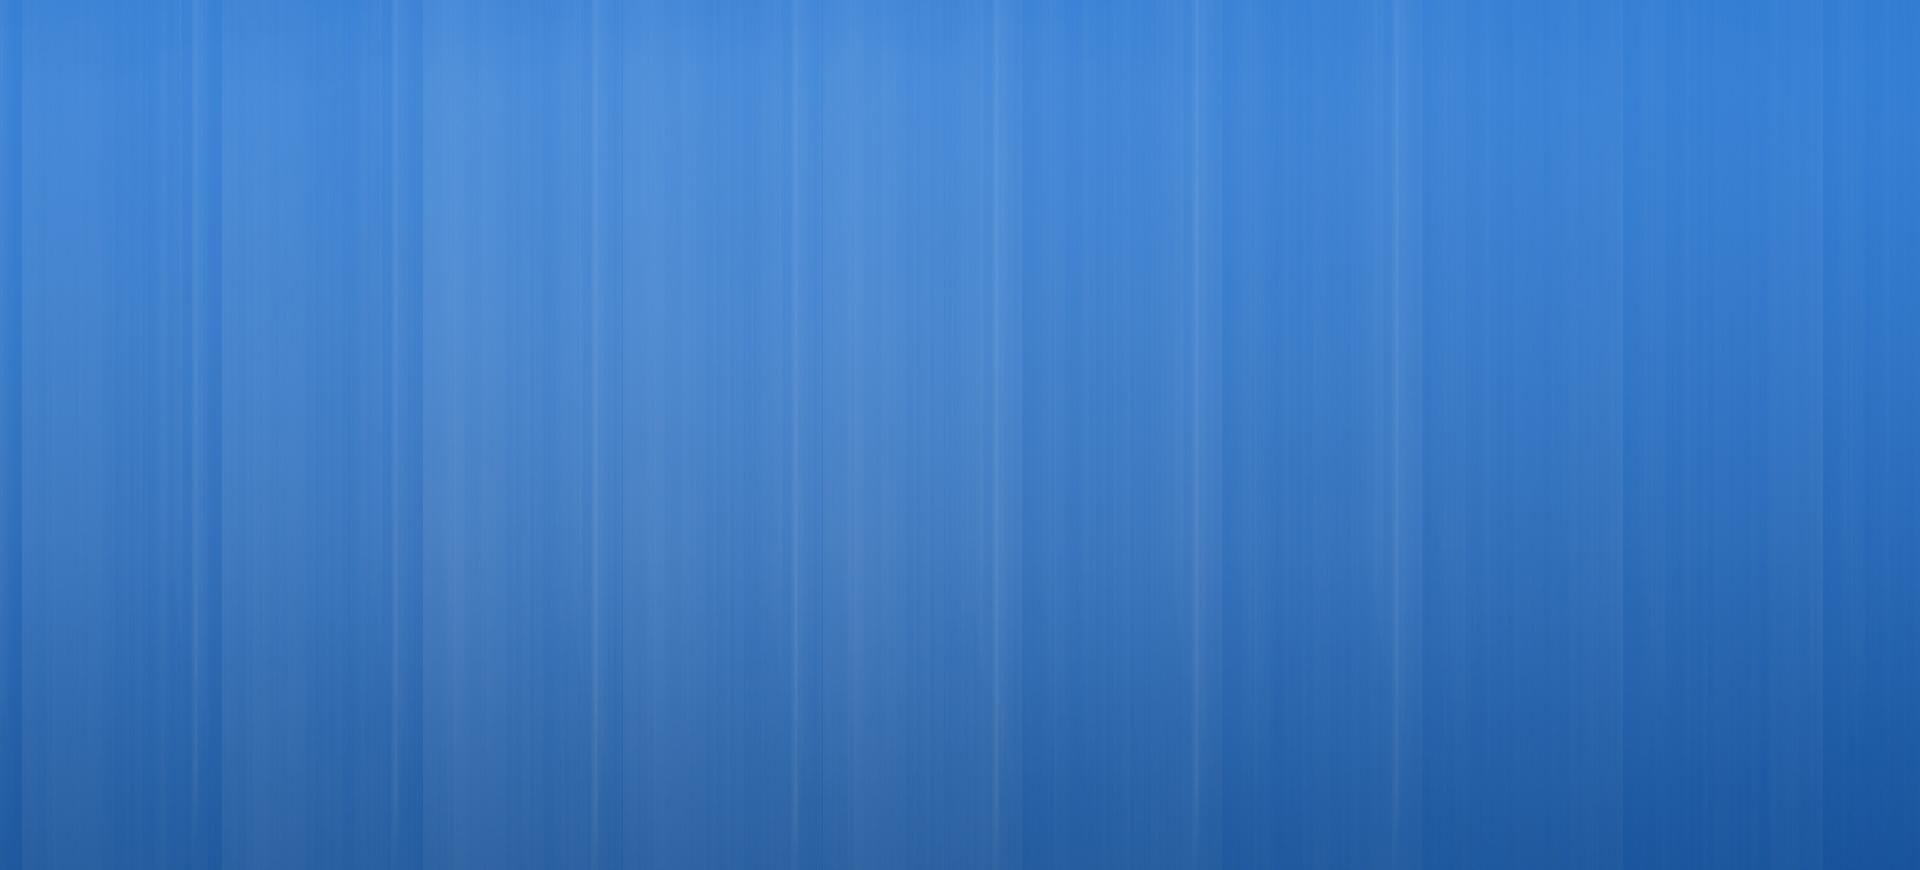 blue_line_background